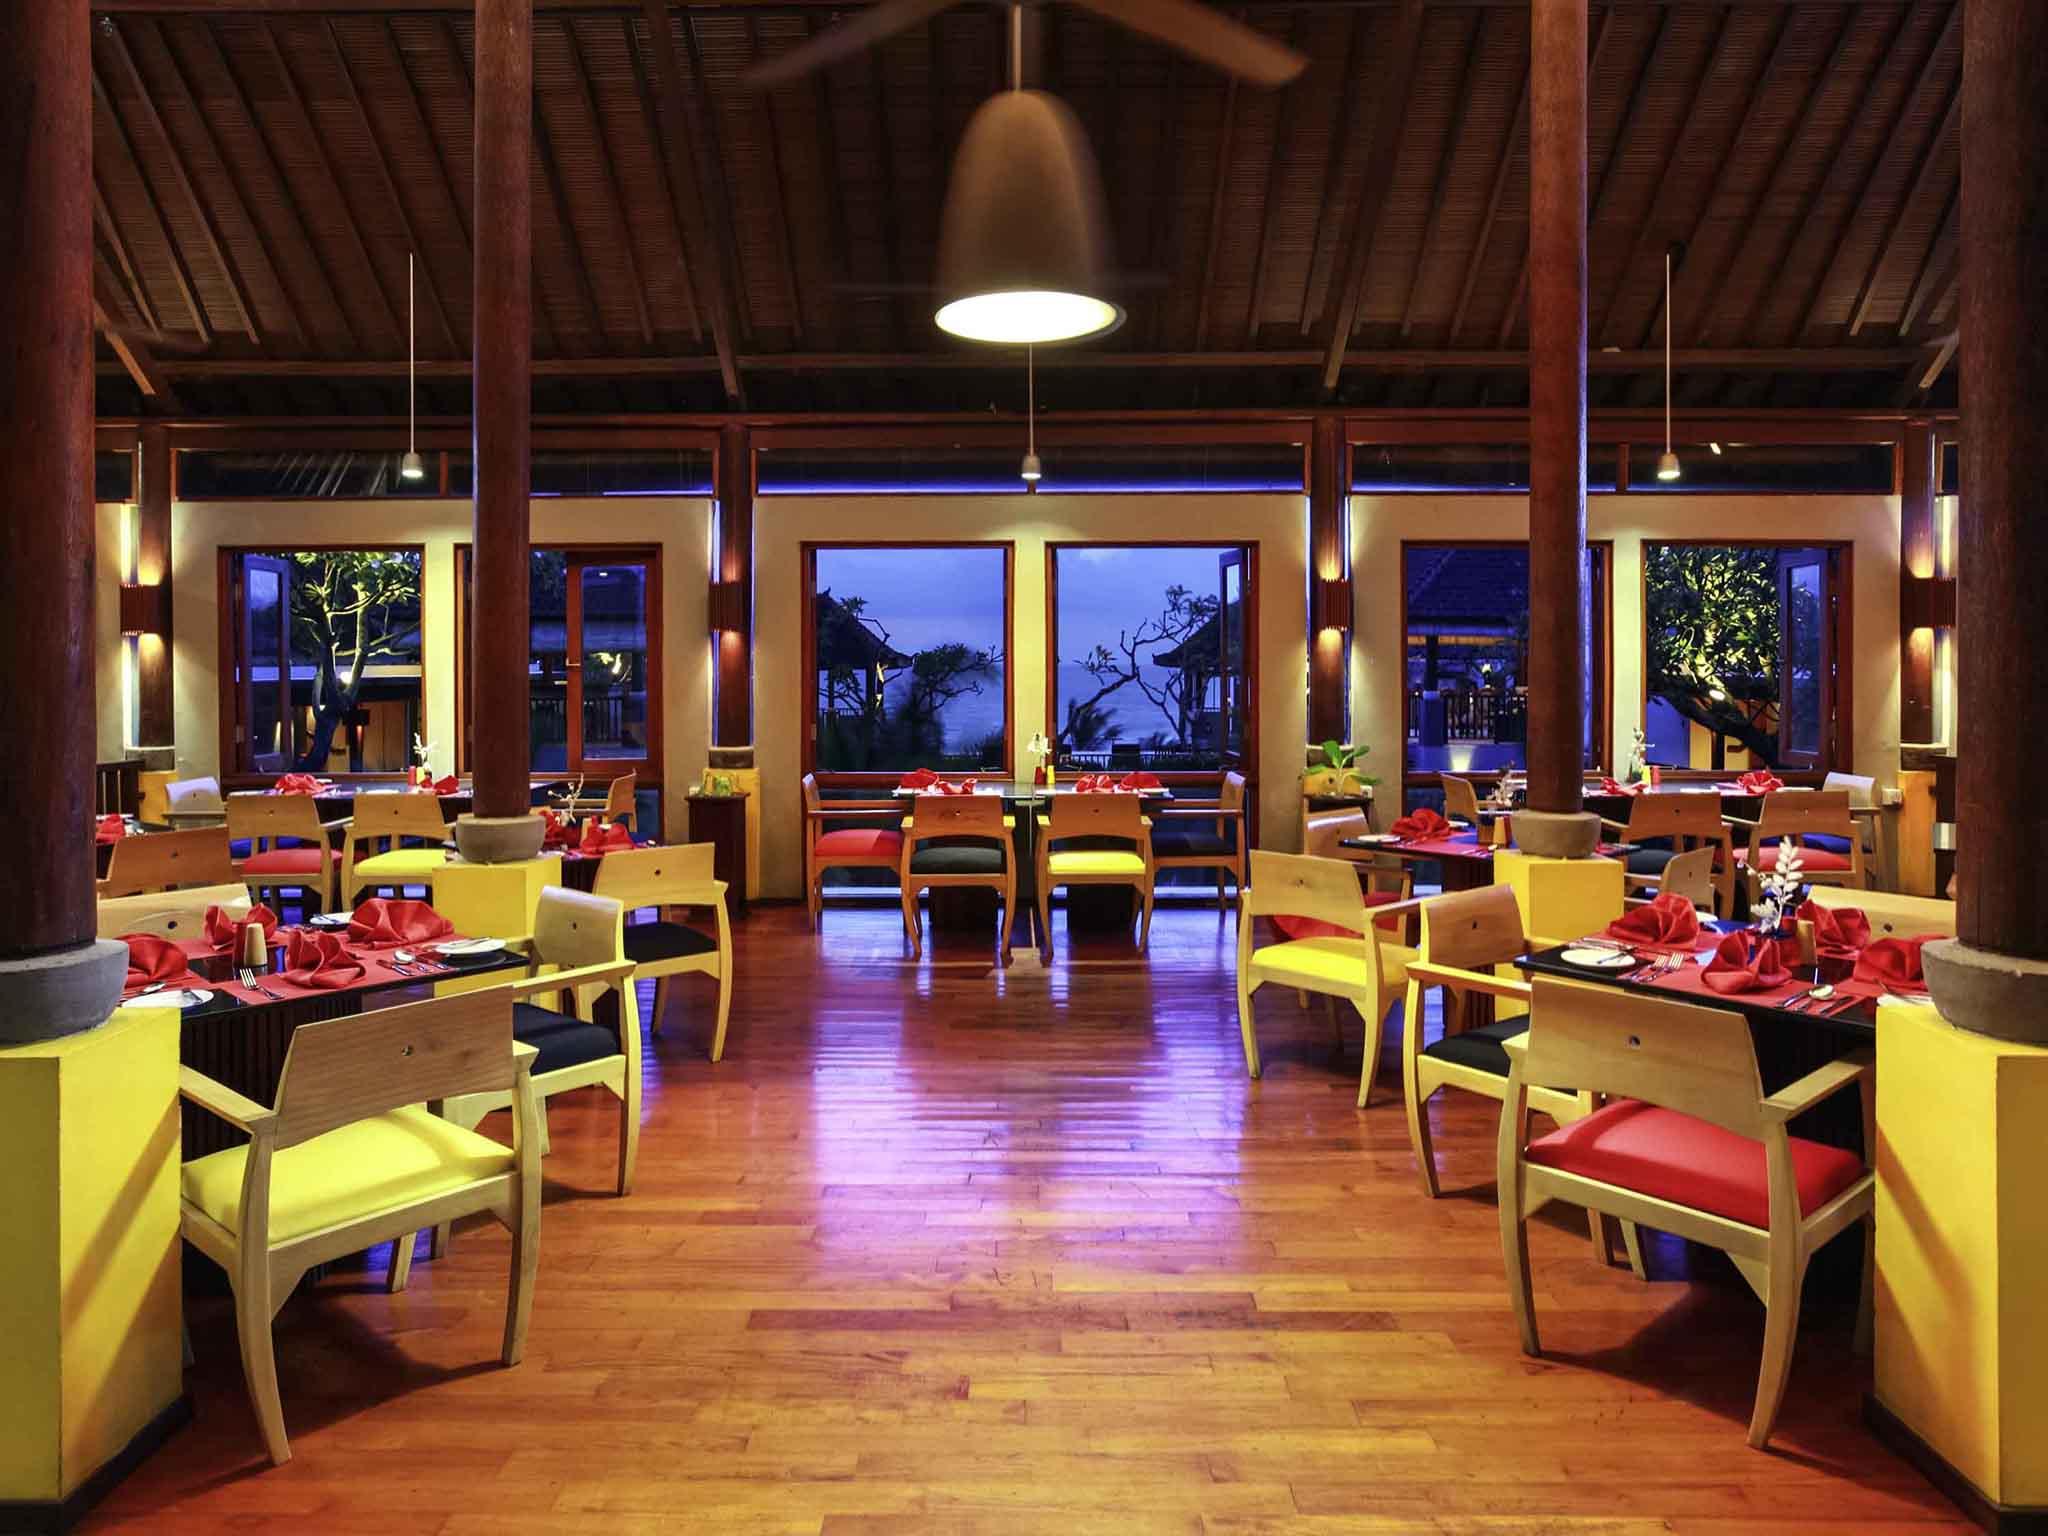 Mercure Kuta Bali Mid Scale Hotel Accorhotels Voucer Best Western Resort Restaurant